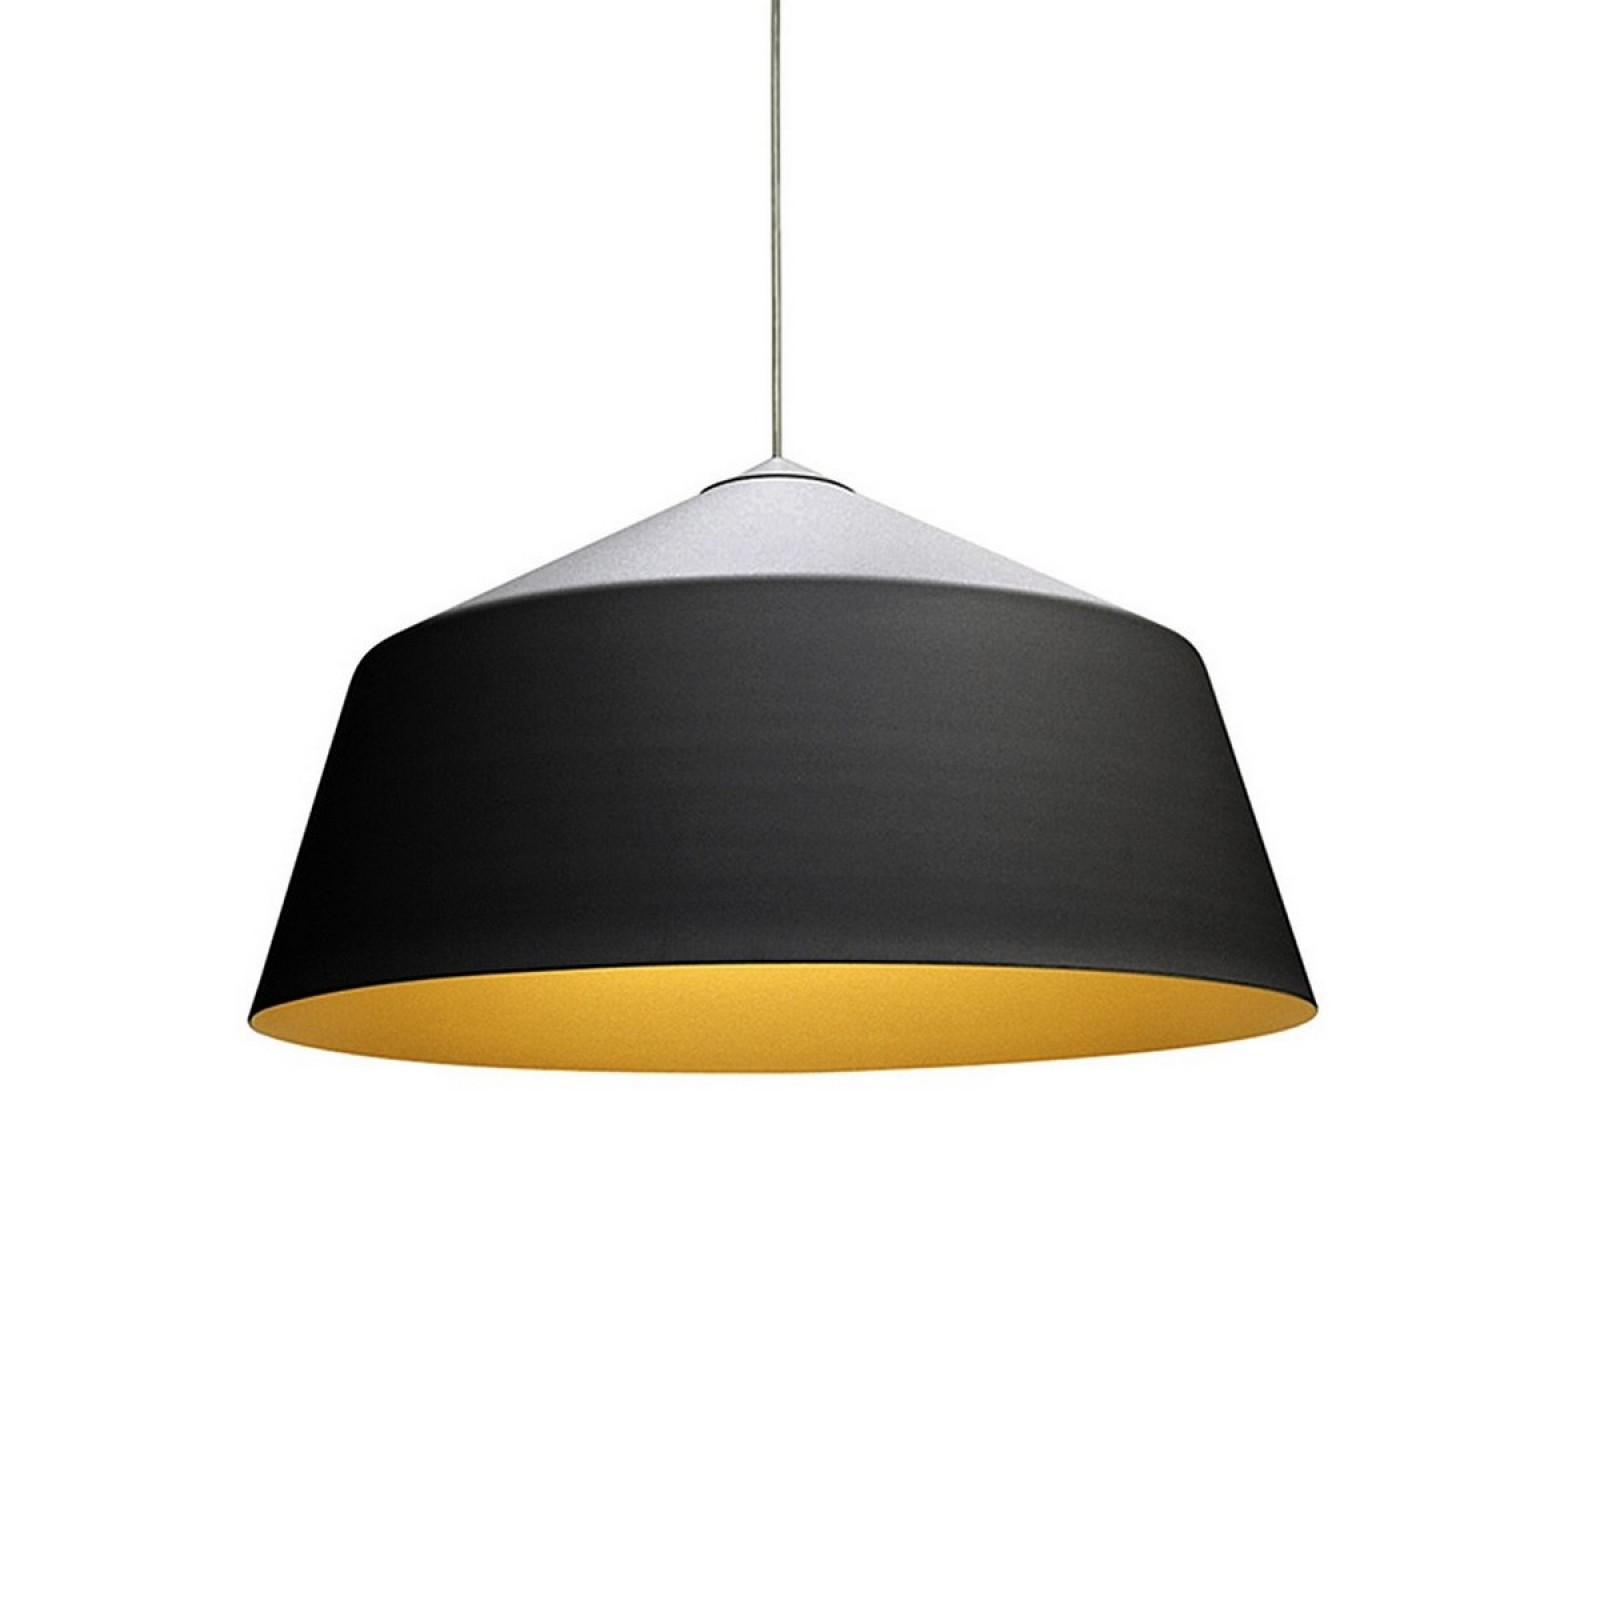 Circus 56 Pendant Lamp - Innermost